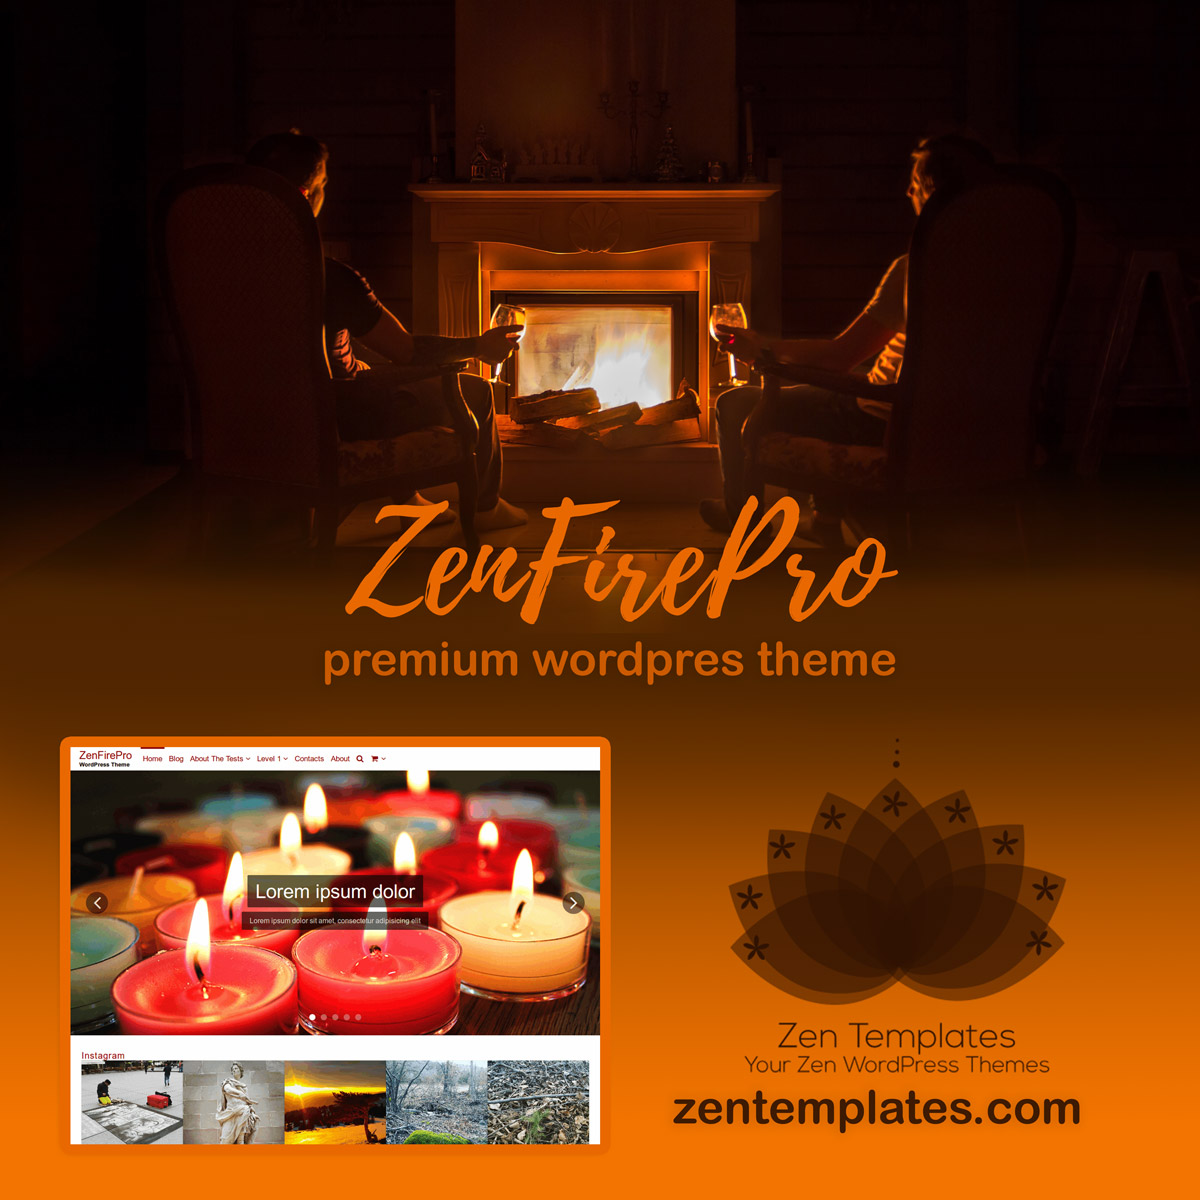 zenfirepro-premium-wordpress-theme-mockup-zentemplates